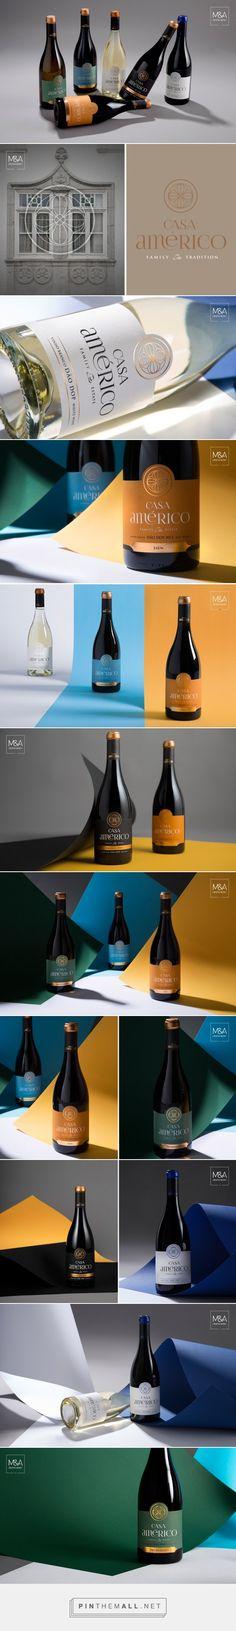 Casa Américo Wine - Packaging of the World - Creative Package Design Gallery - http://www.packagingoftheworld.com/2017/01/casa-americo.html